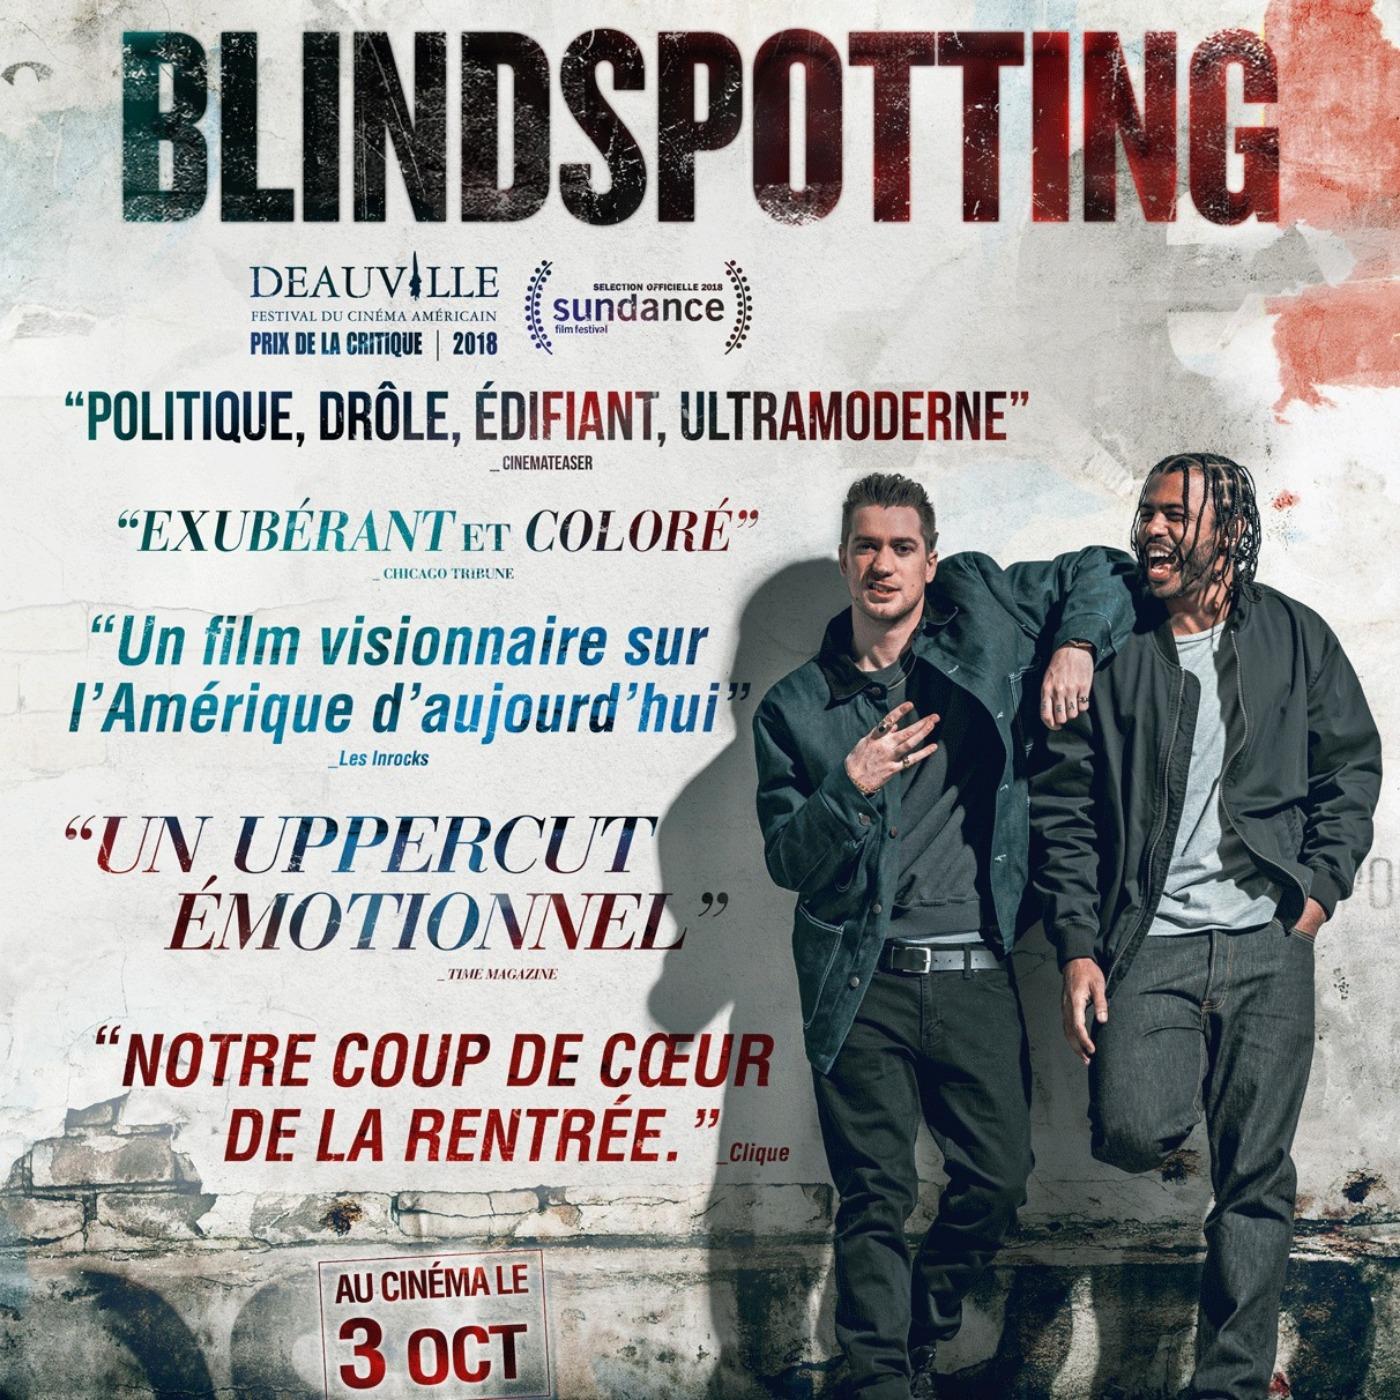 CRITIQUE DU FILM BLINDSPOTTING